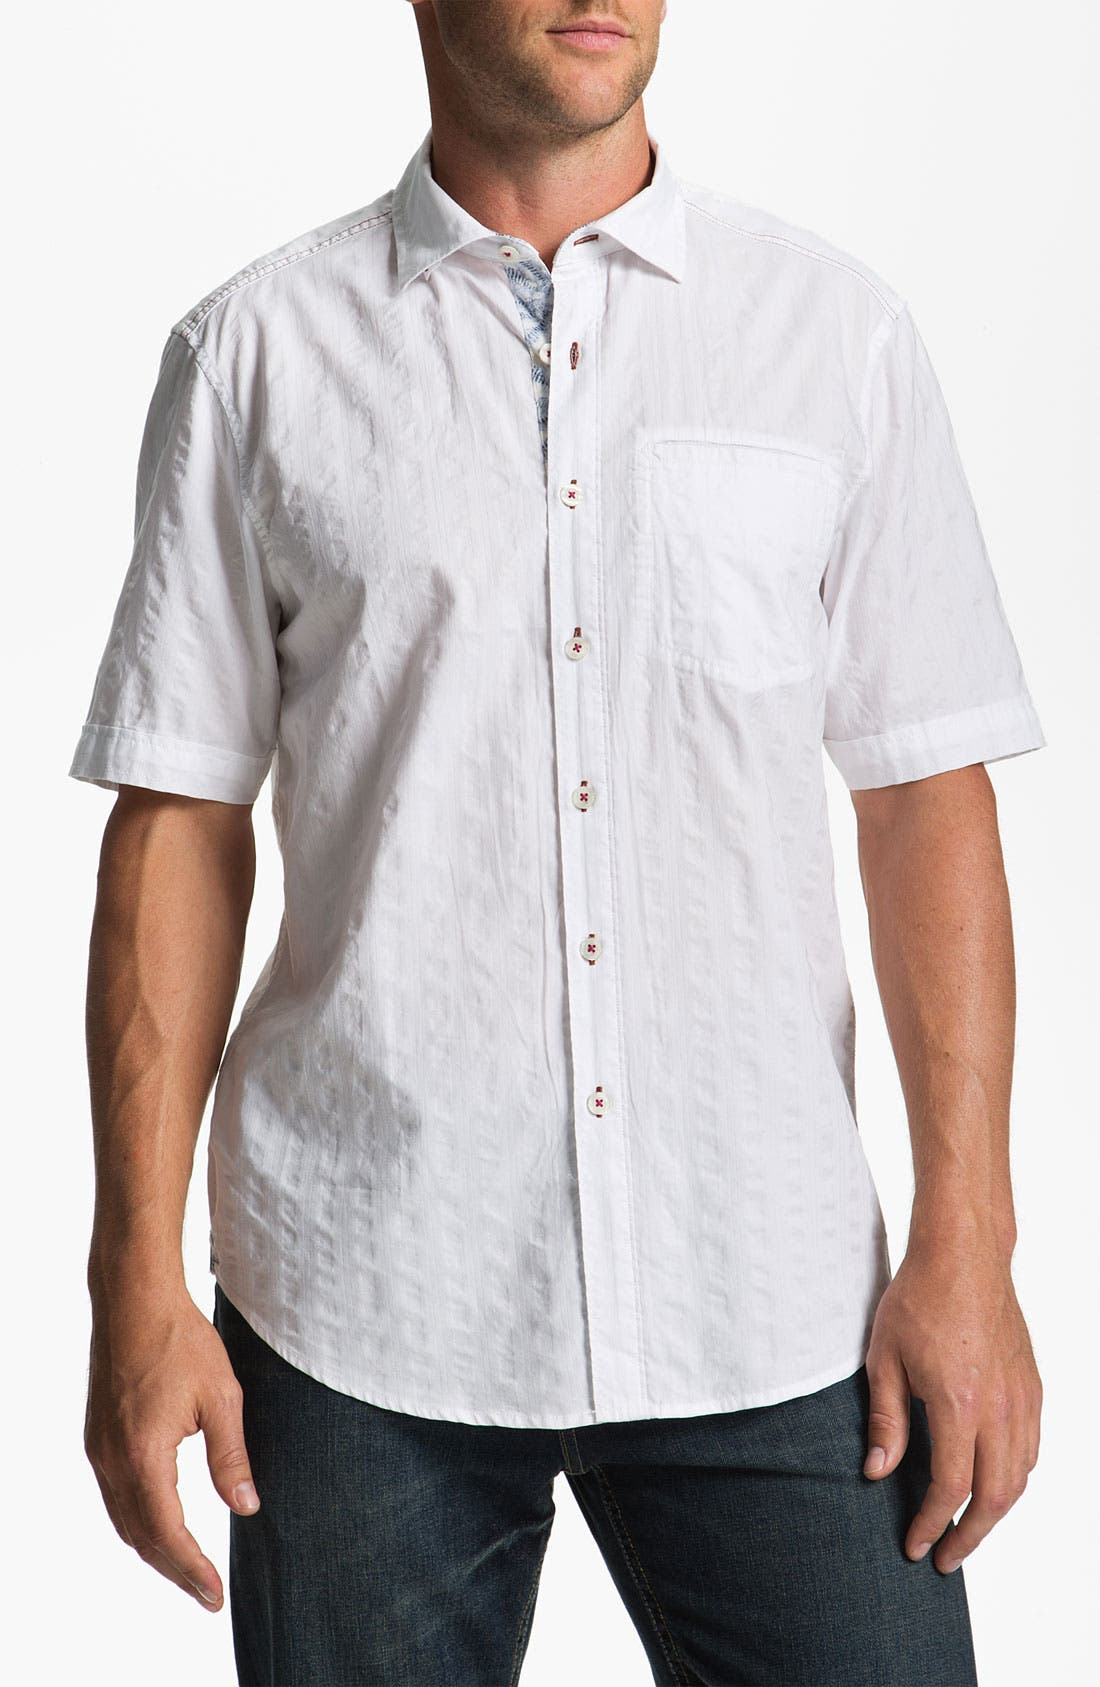 Main Image - Tommy Bahama 'White Stripe' Sport Shirt